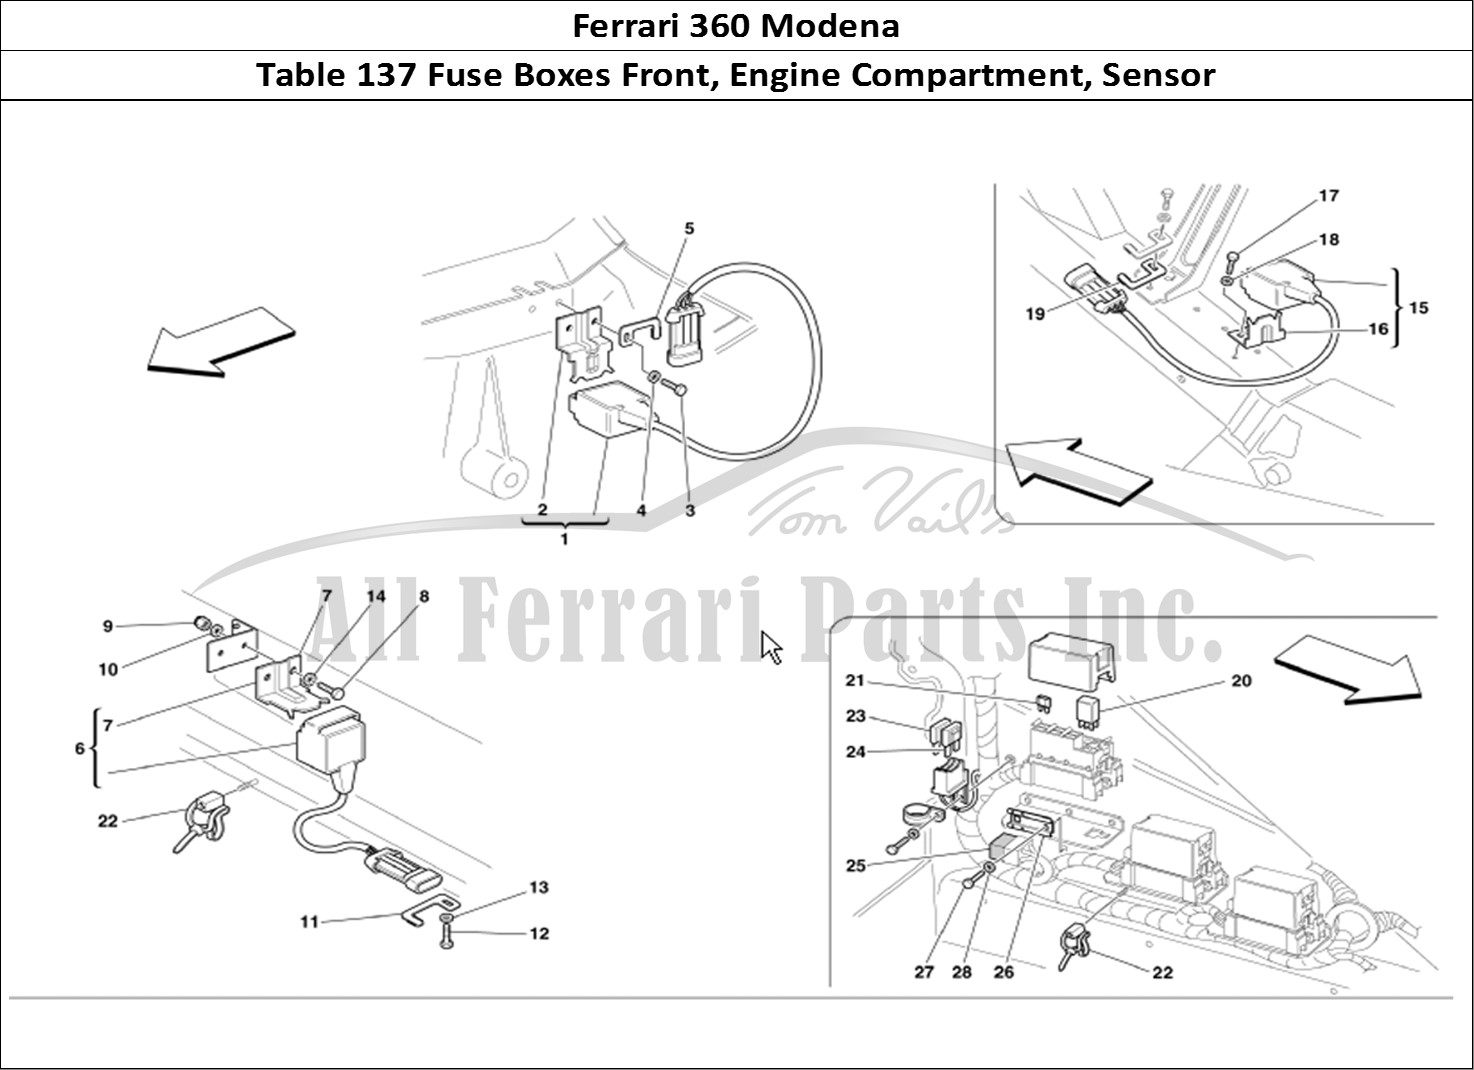 Buy Original Ferrari 360 Modena 137 Fuse Boxes Front